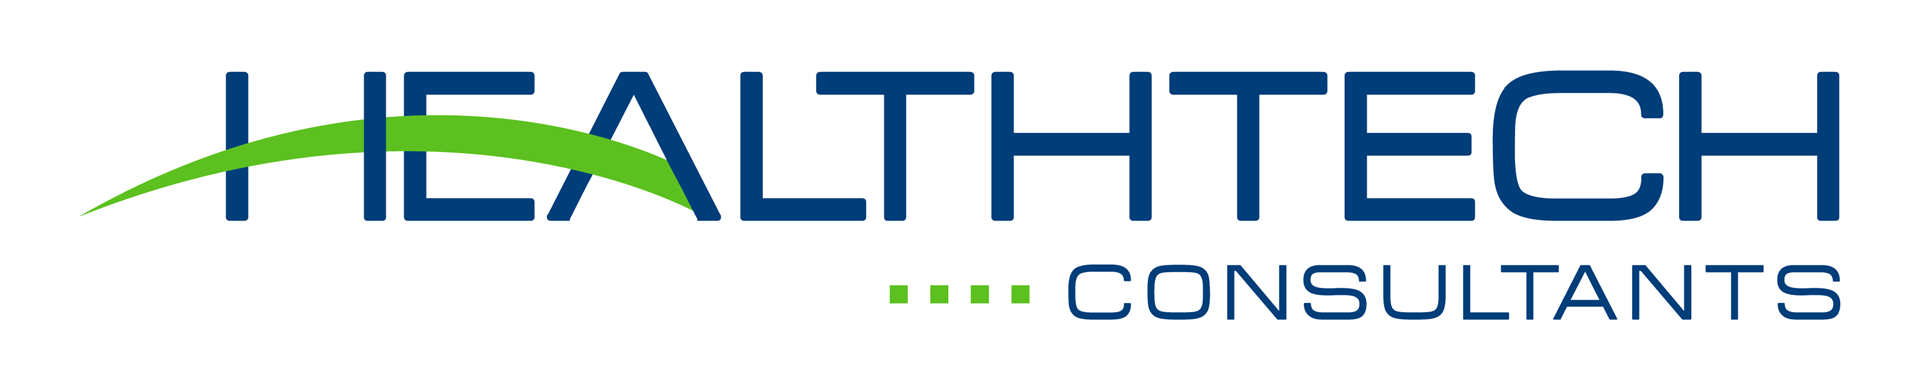 Healthtech Consultants